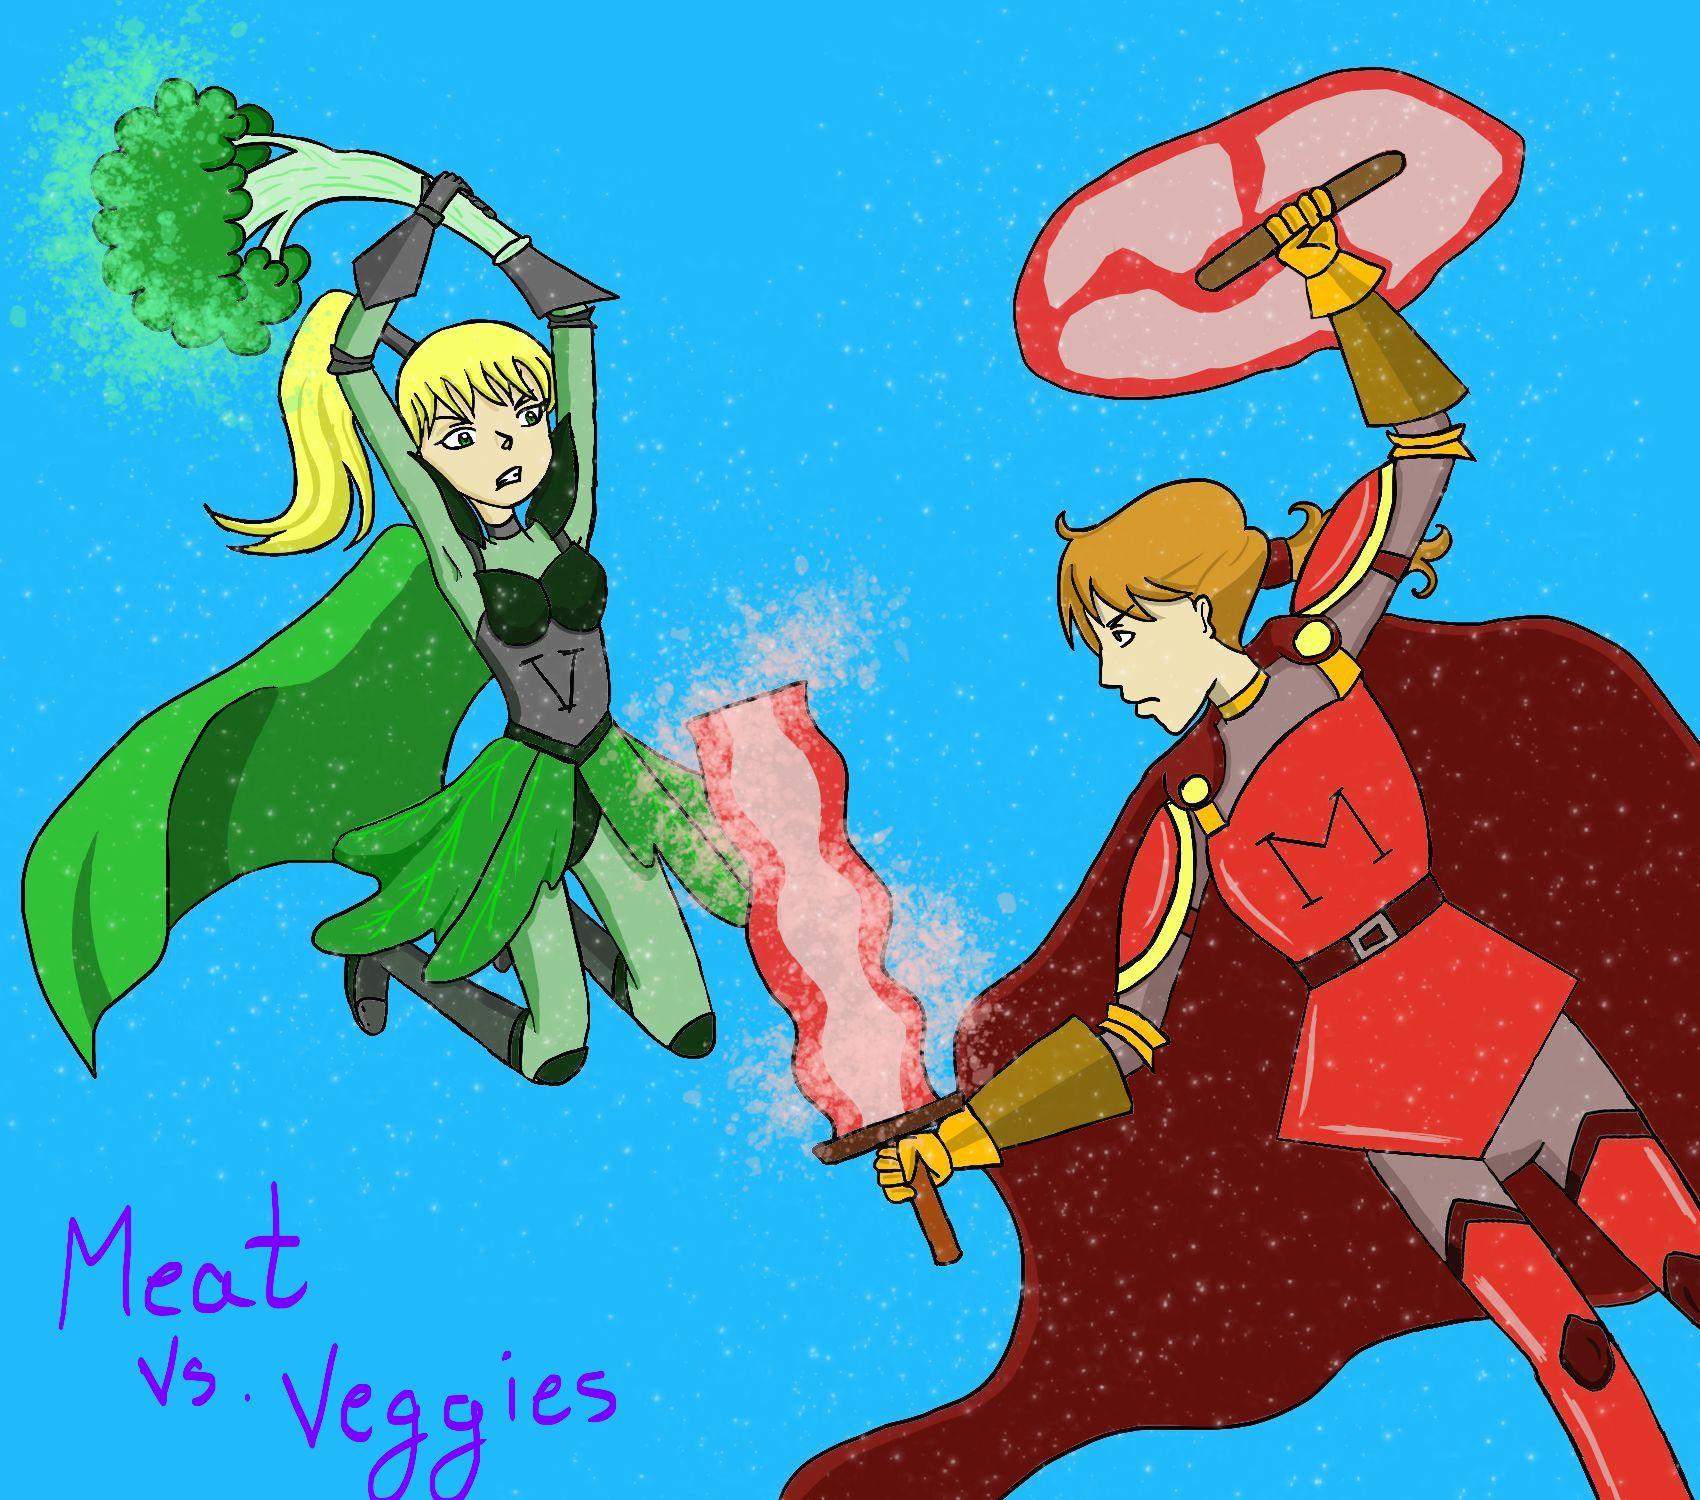 Comic of female super hero swinging broccoli club at male meat super hero holding bacon sword and ham shield.